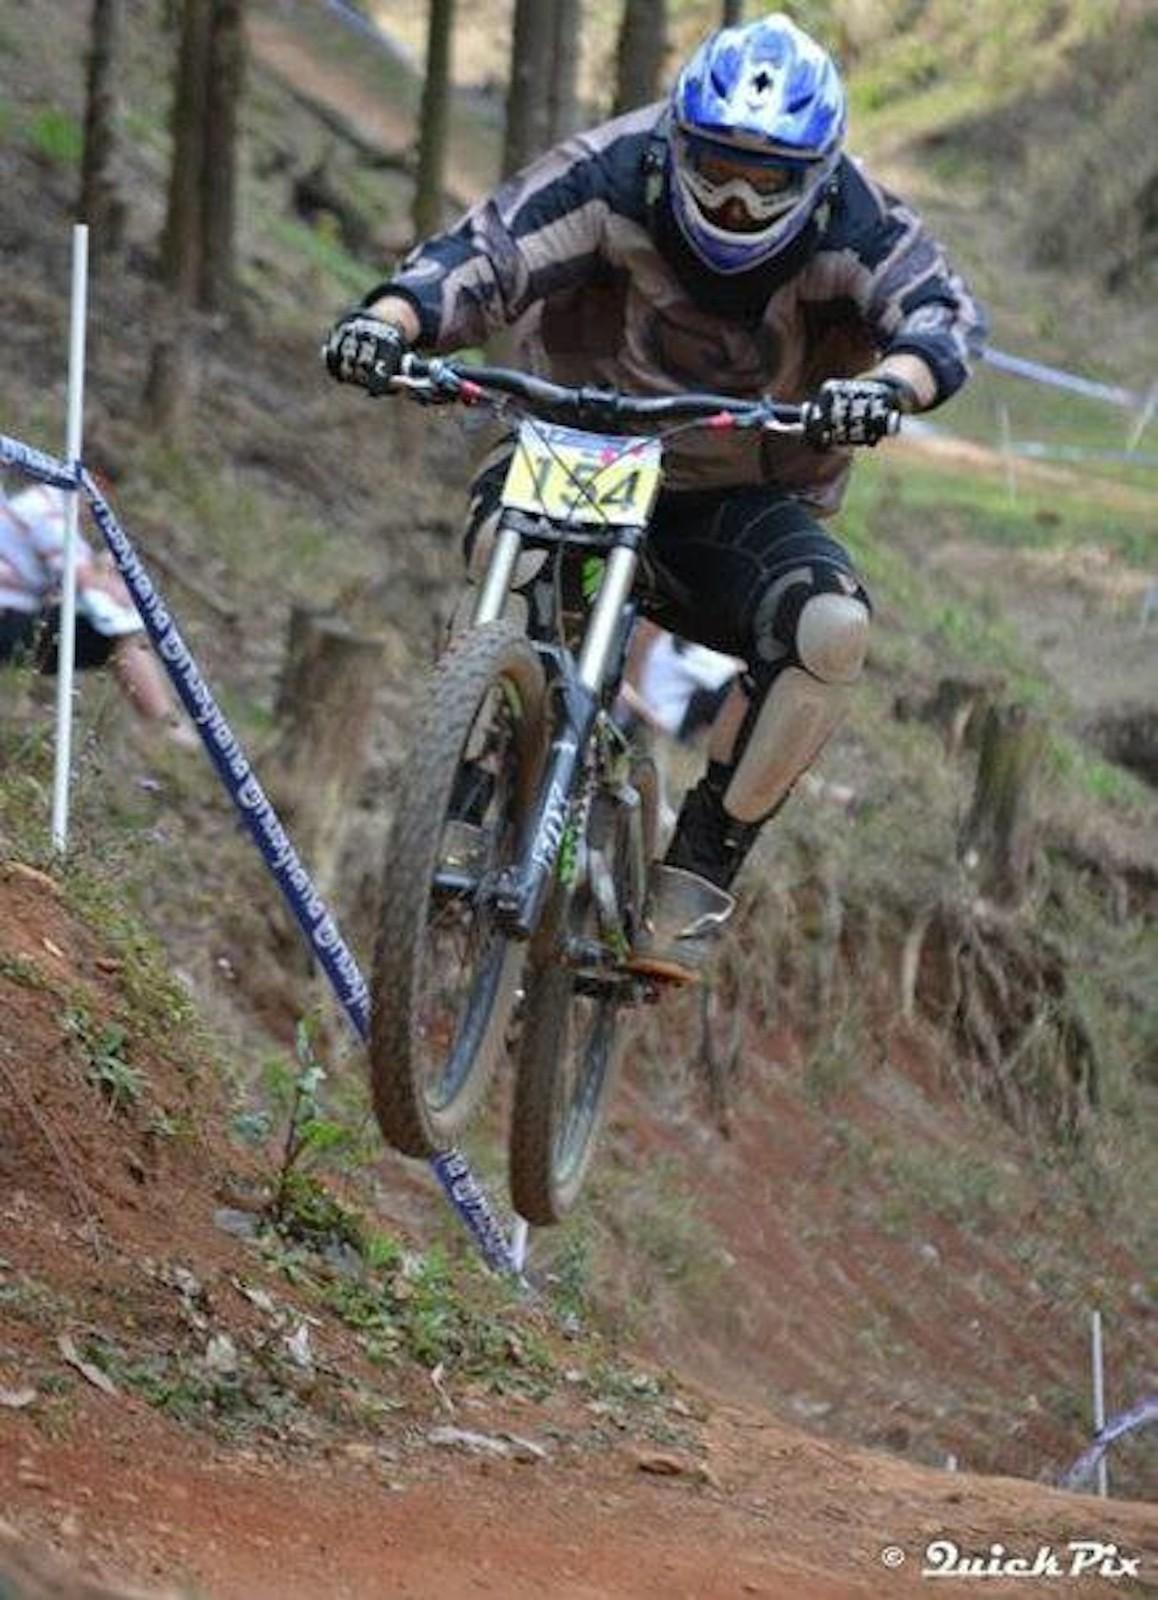 1208716 10201322023549295 756546631 n - nvb101 - Mountain Biking Pictures - Vital MTB